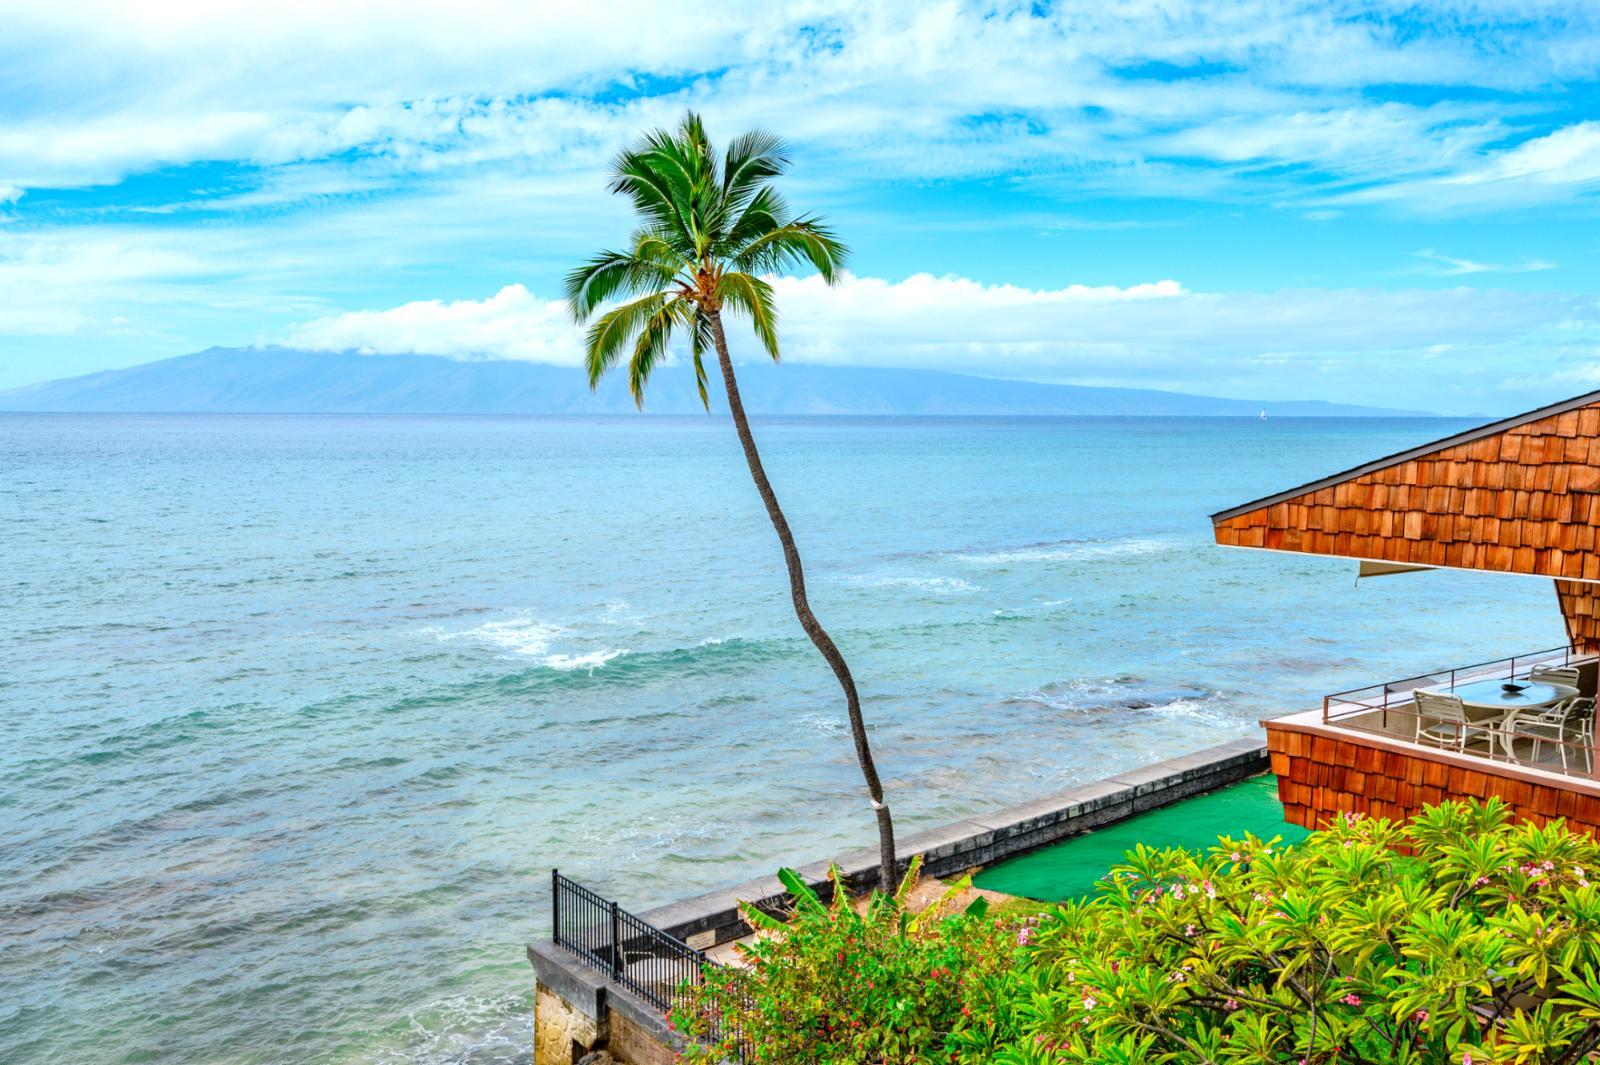 Bi island views of Lanai and Molokai